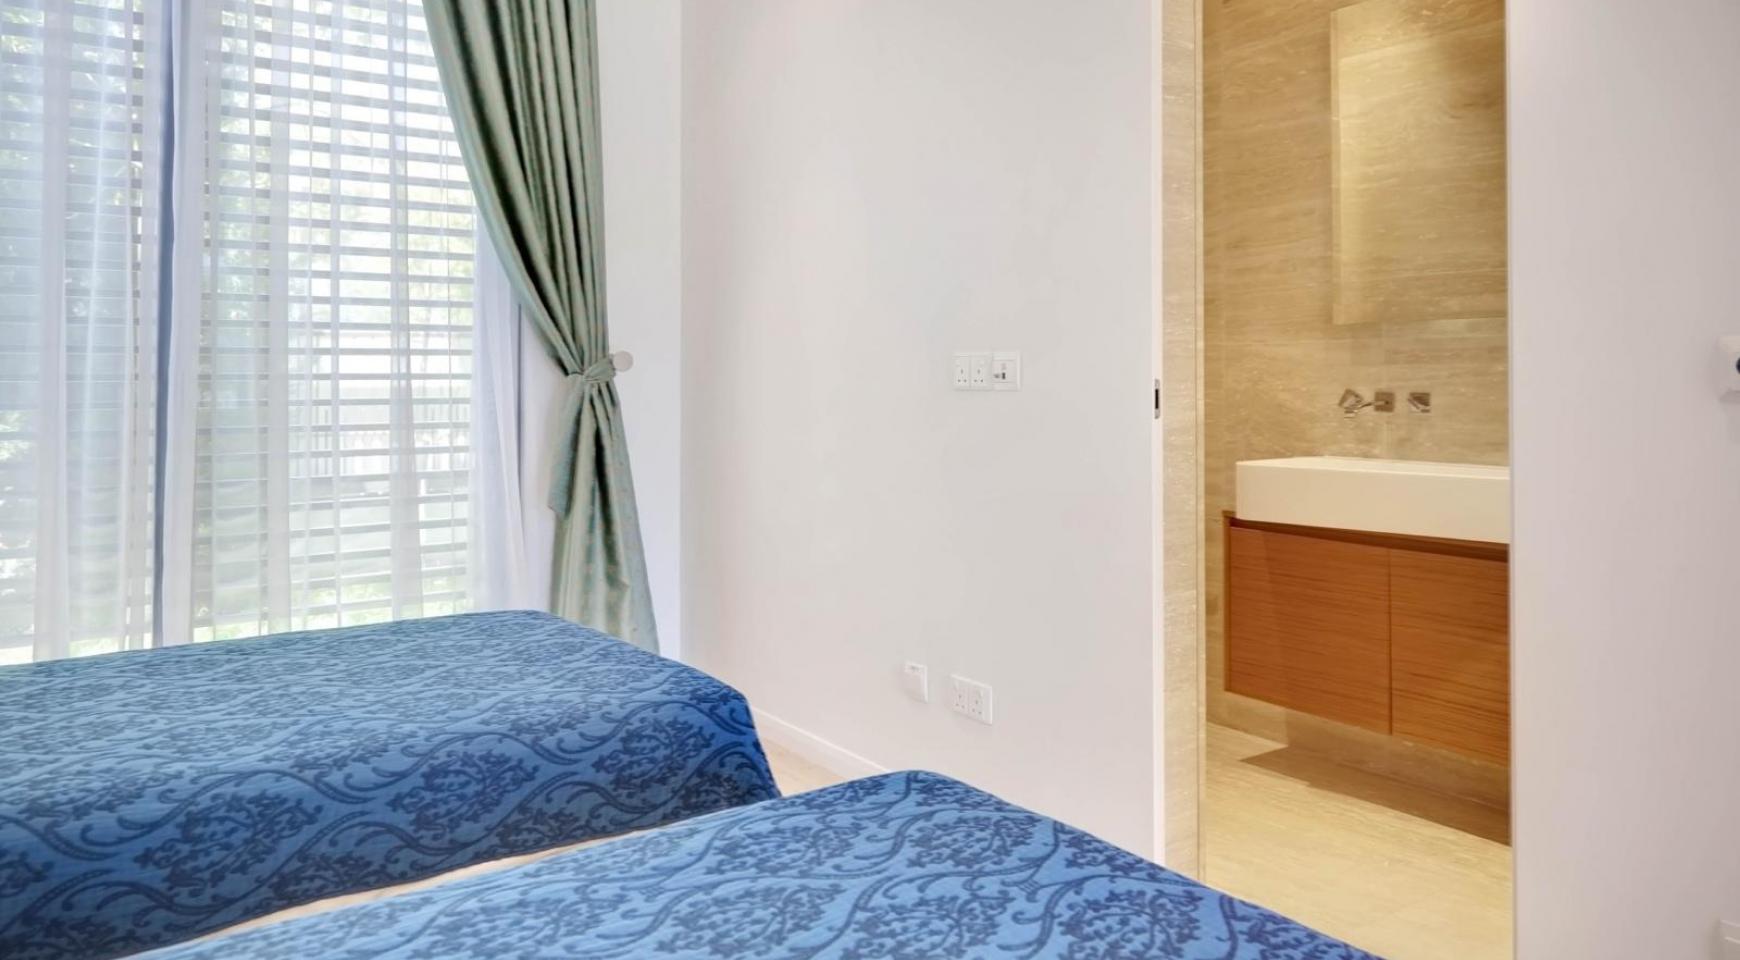 New Luxurious 4 Bedroom Villa in the Tourist Area - 35